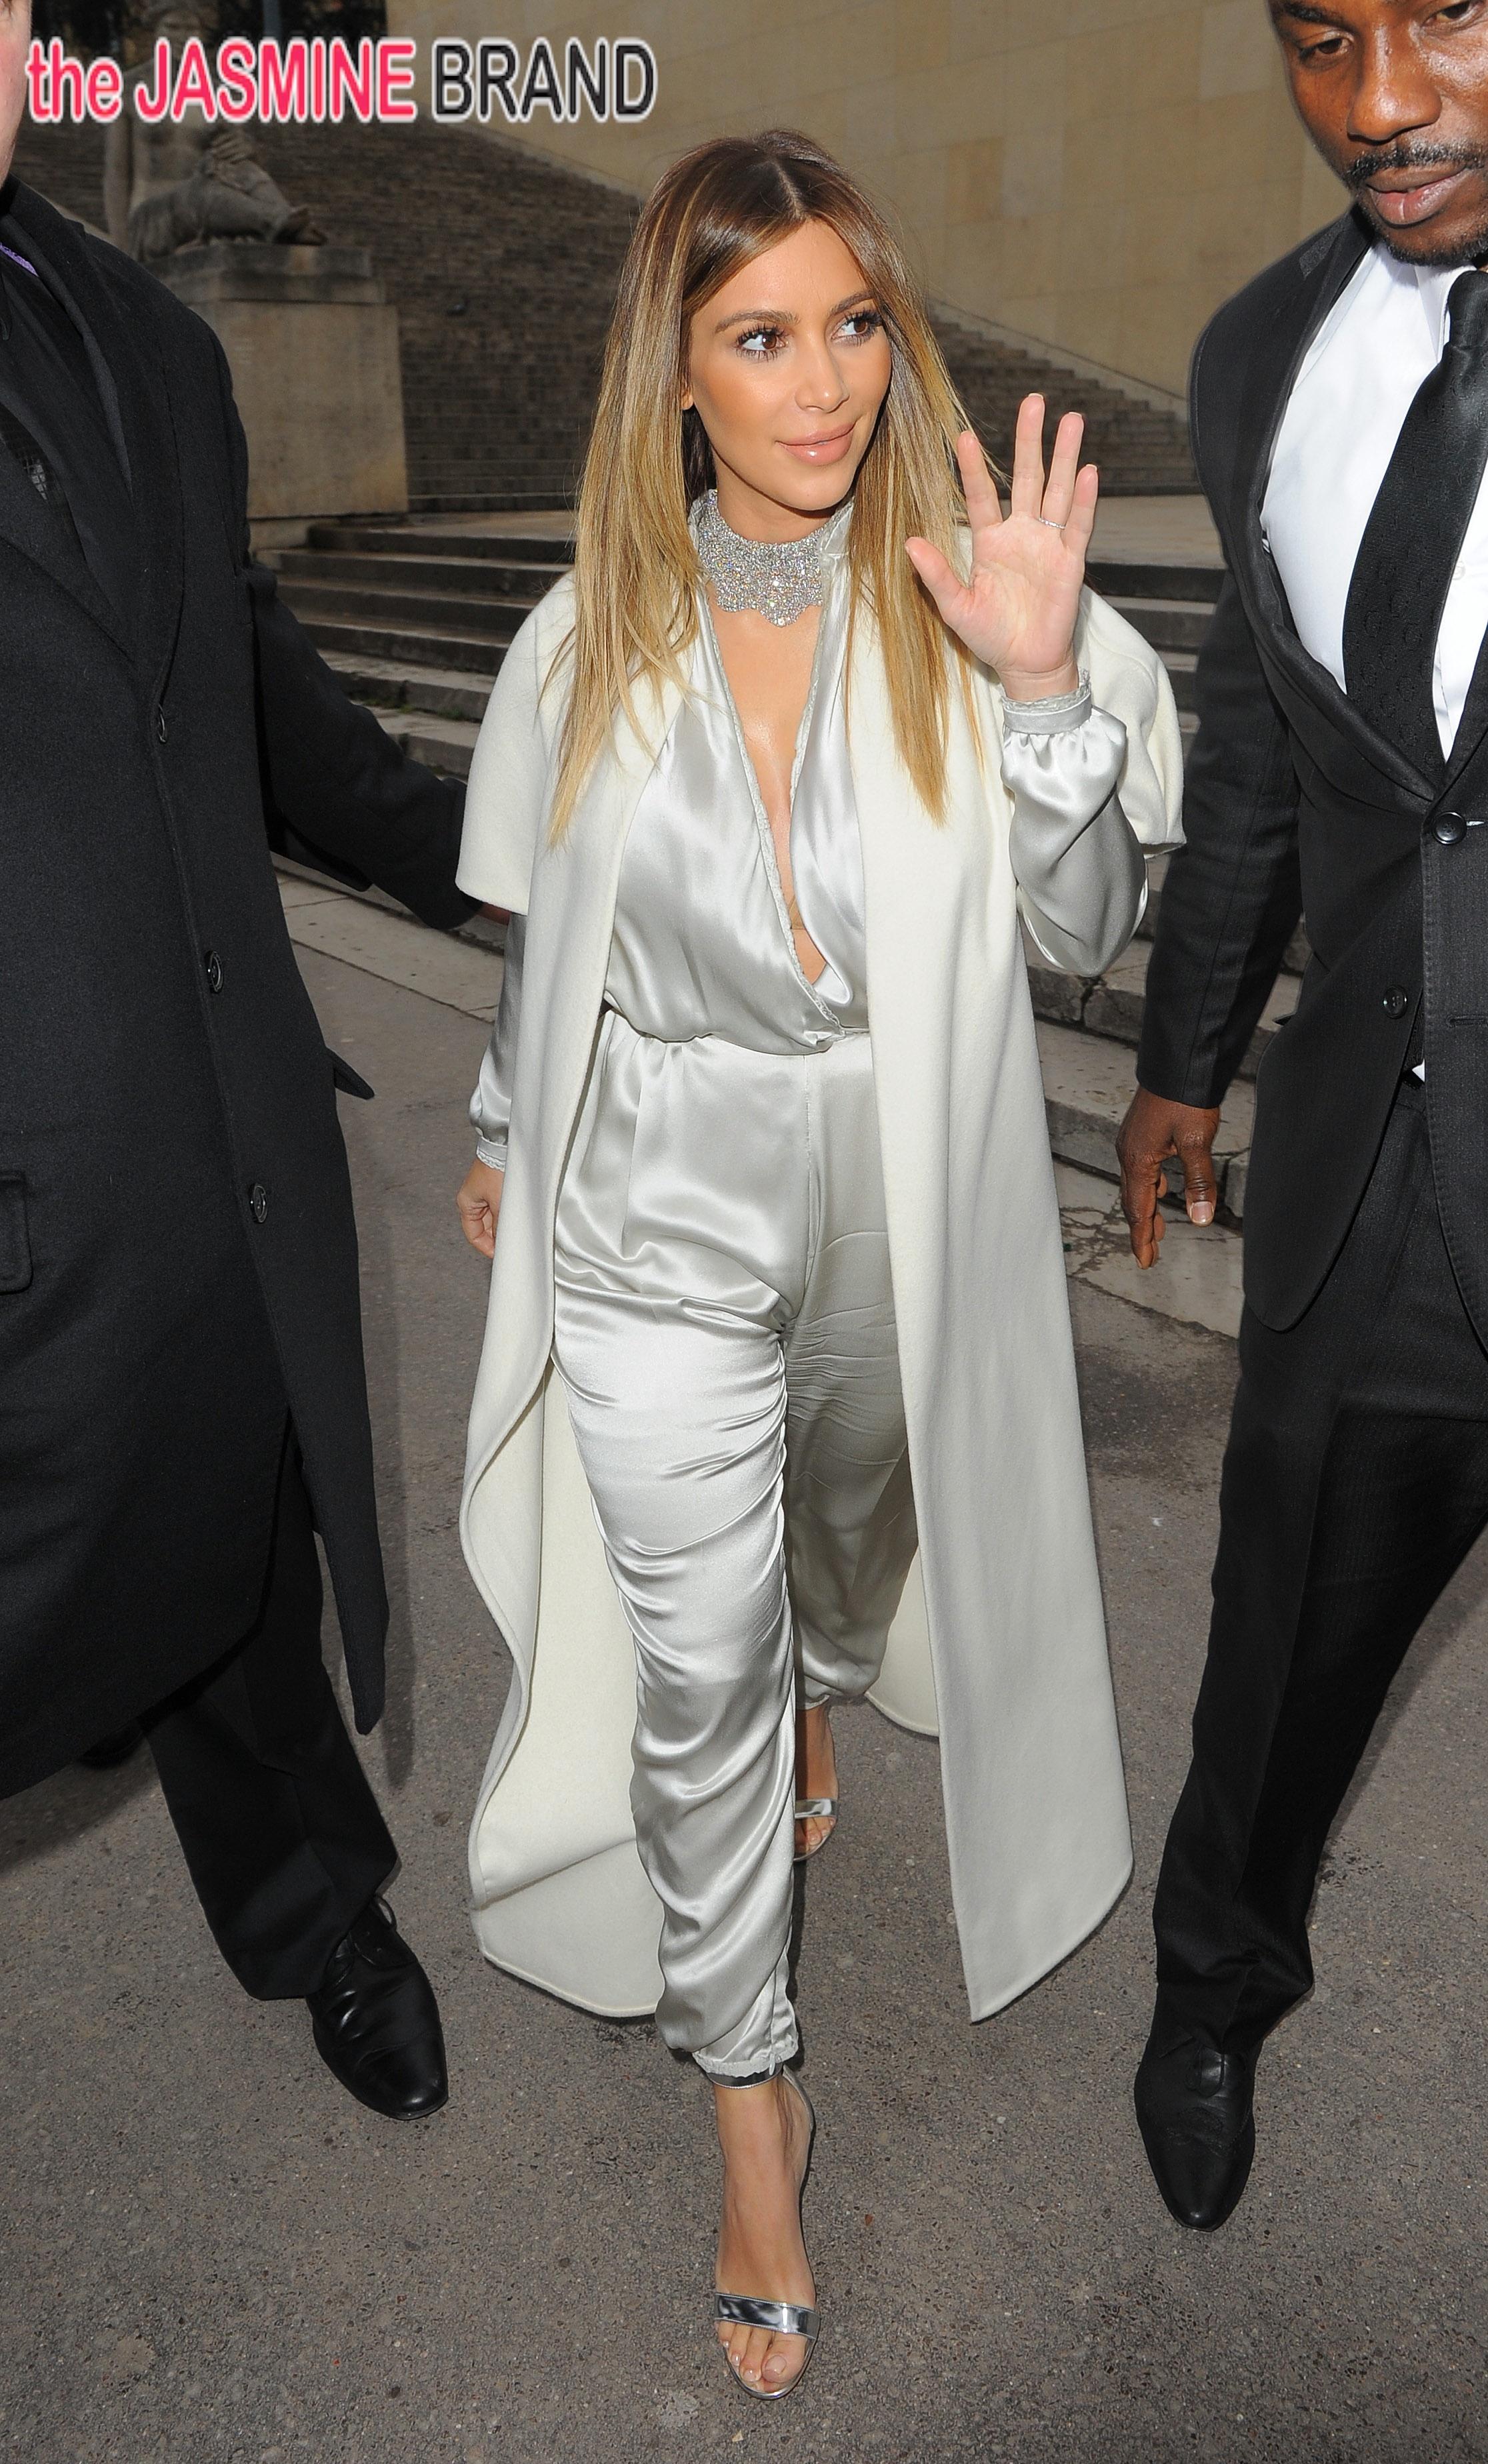 Kim Kardashian and Kanye West leaving Le Maurice Hotel